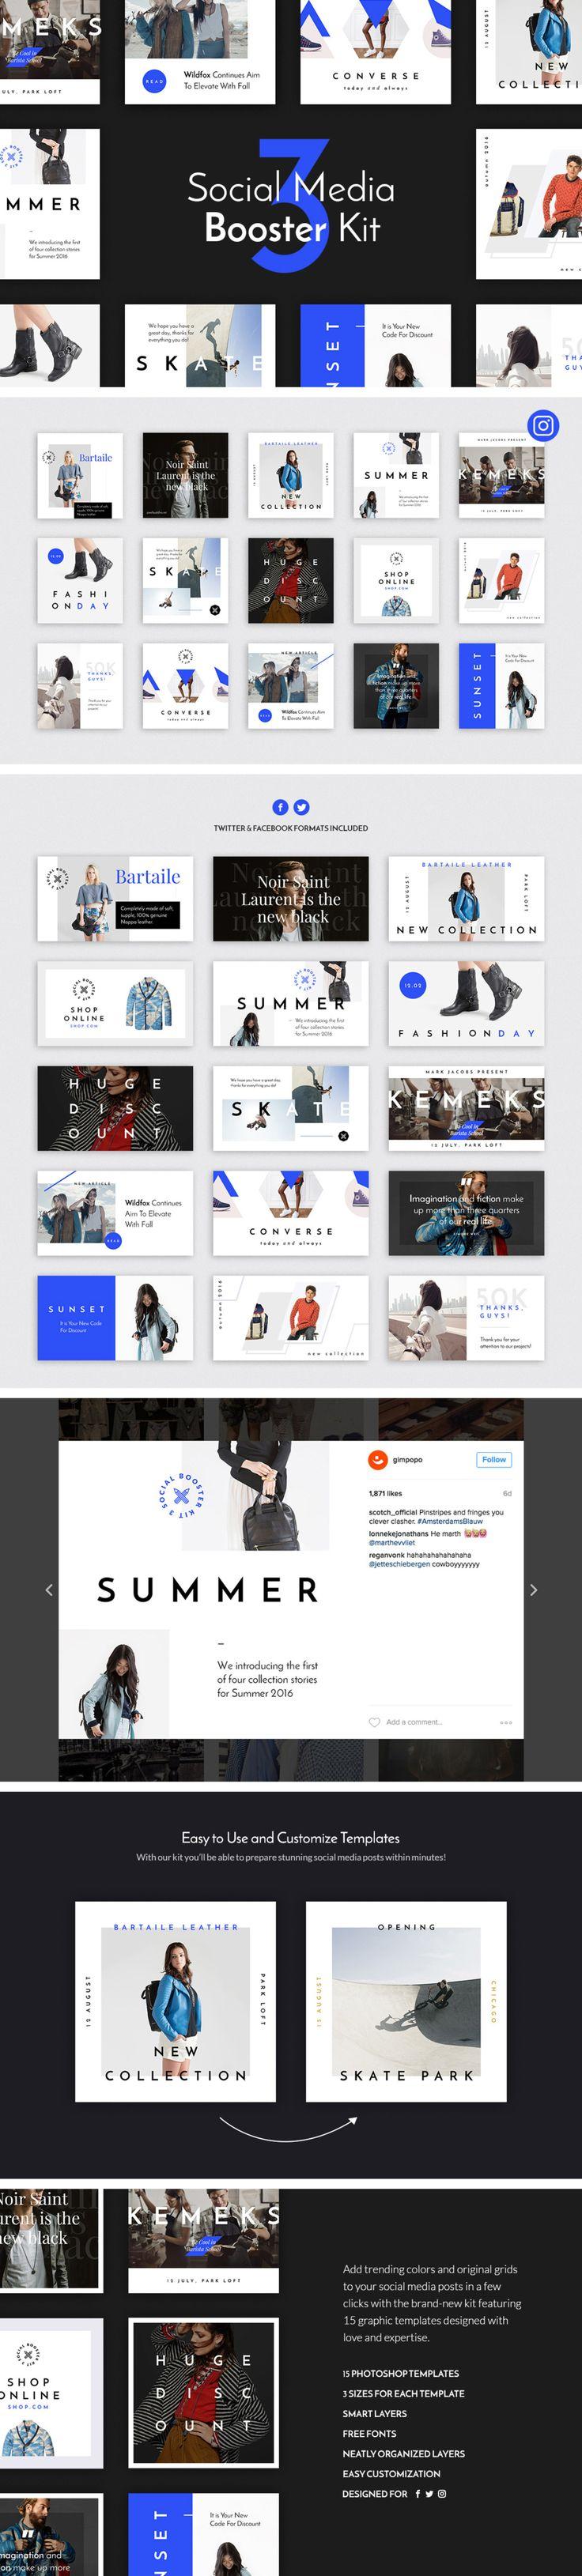 15 Creative social media templates